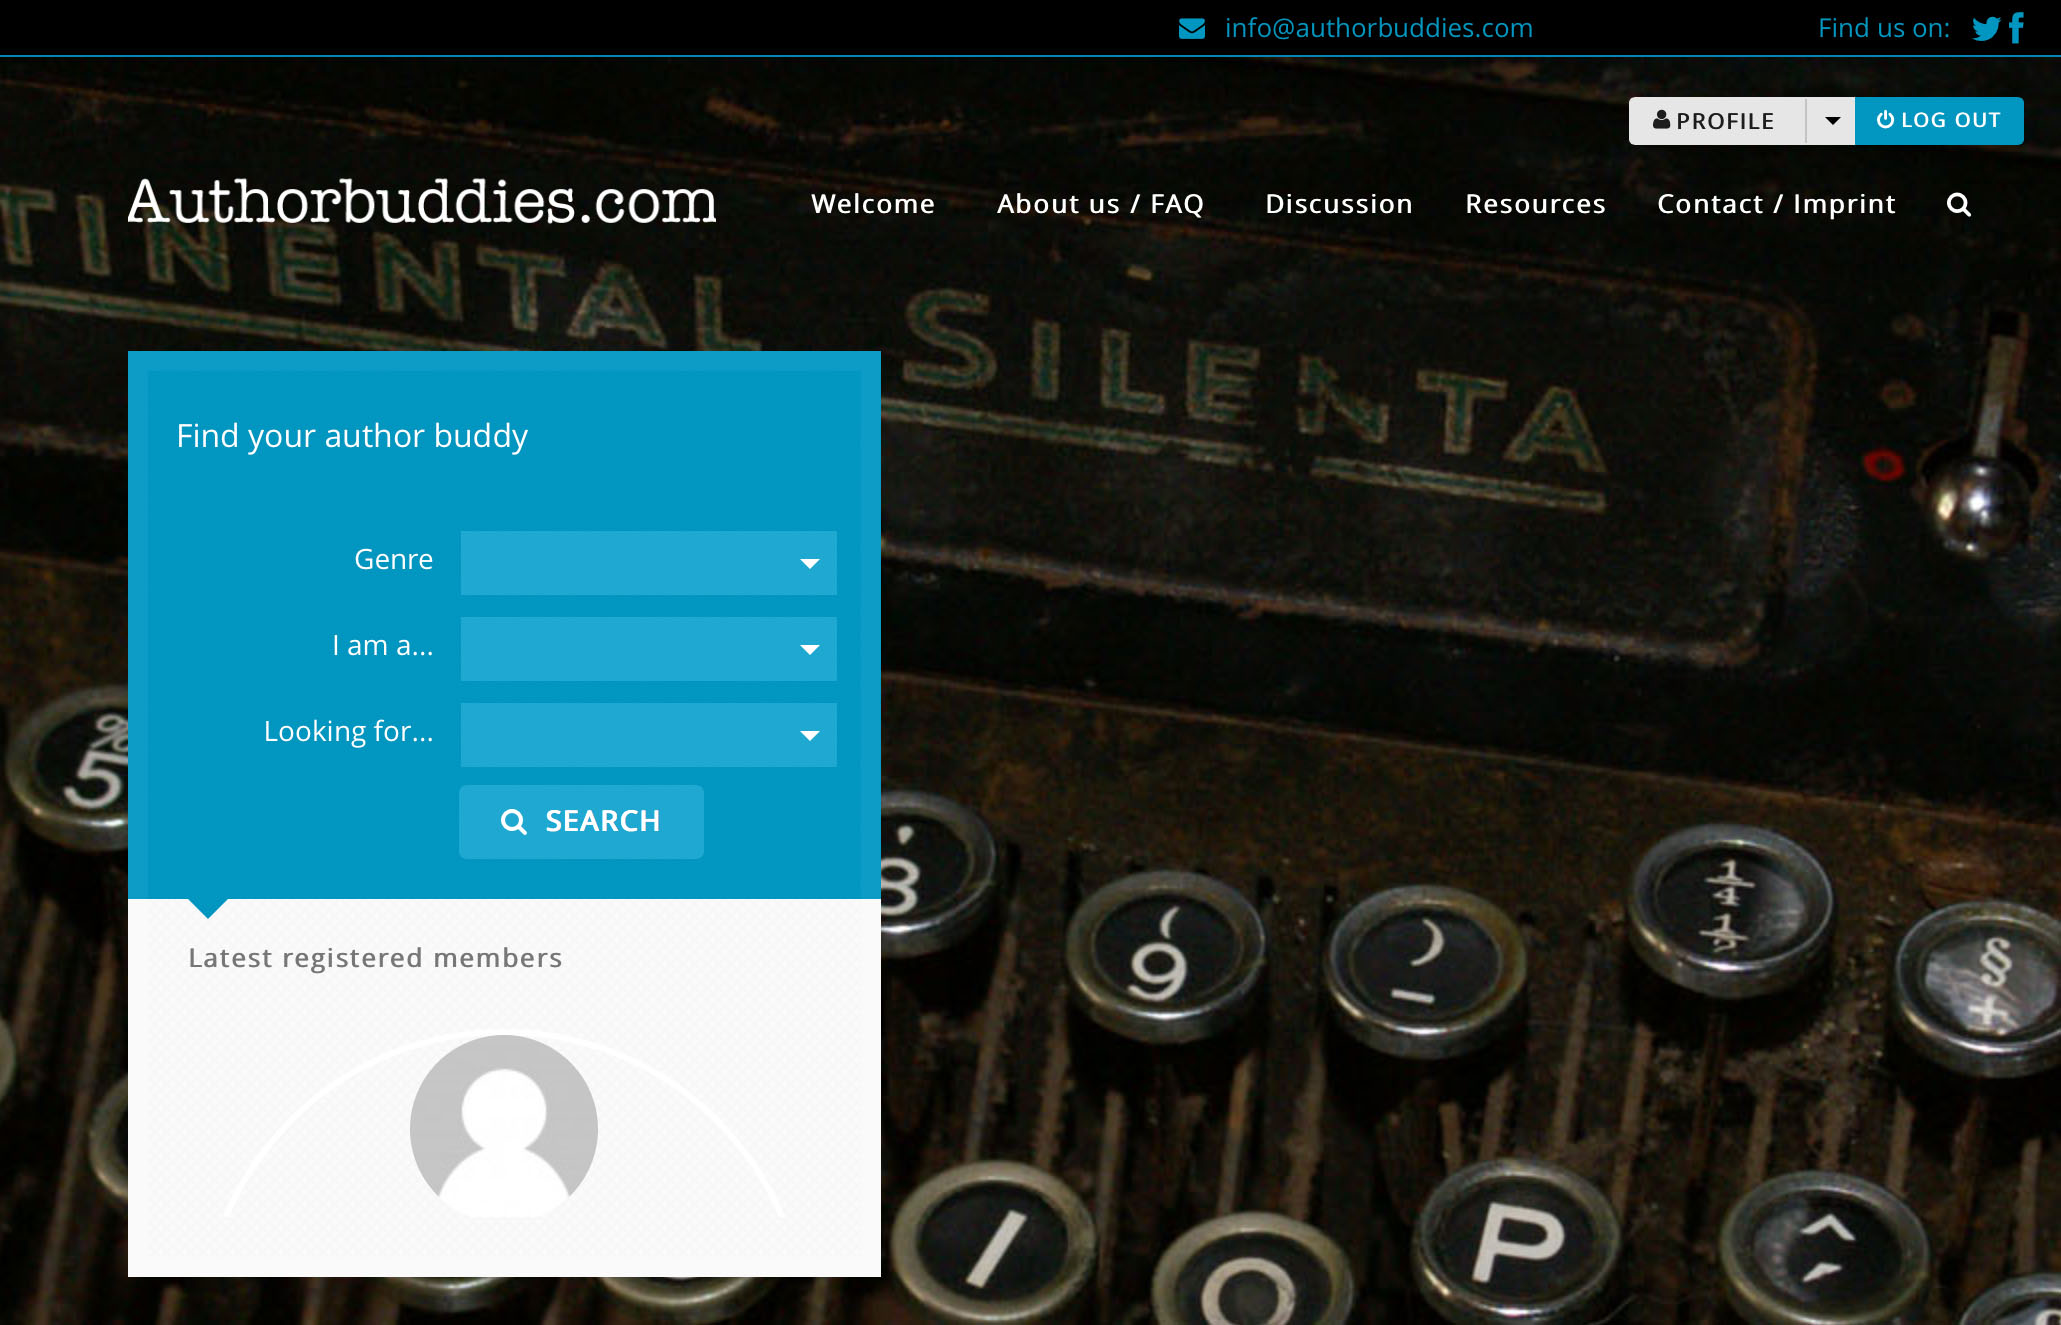 Authorbuddies.com